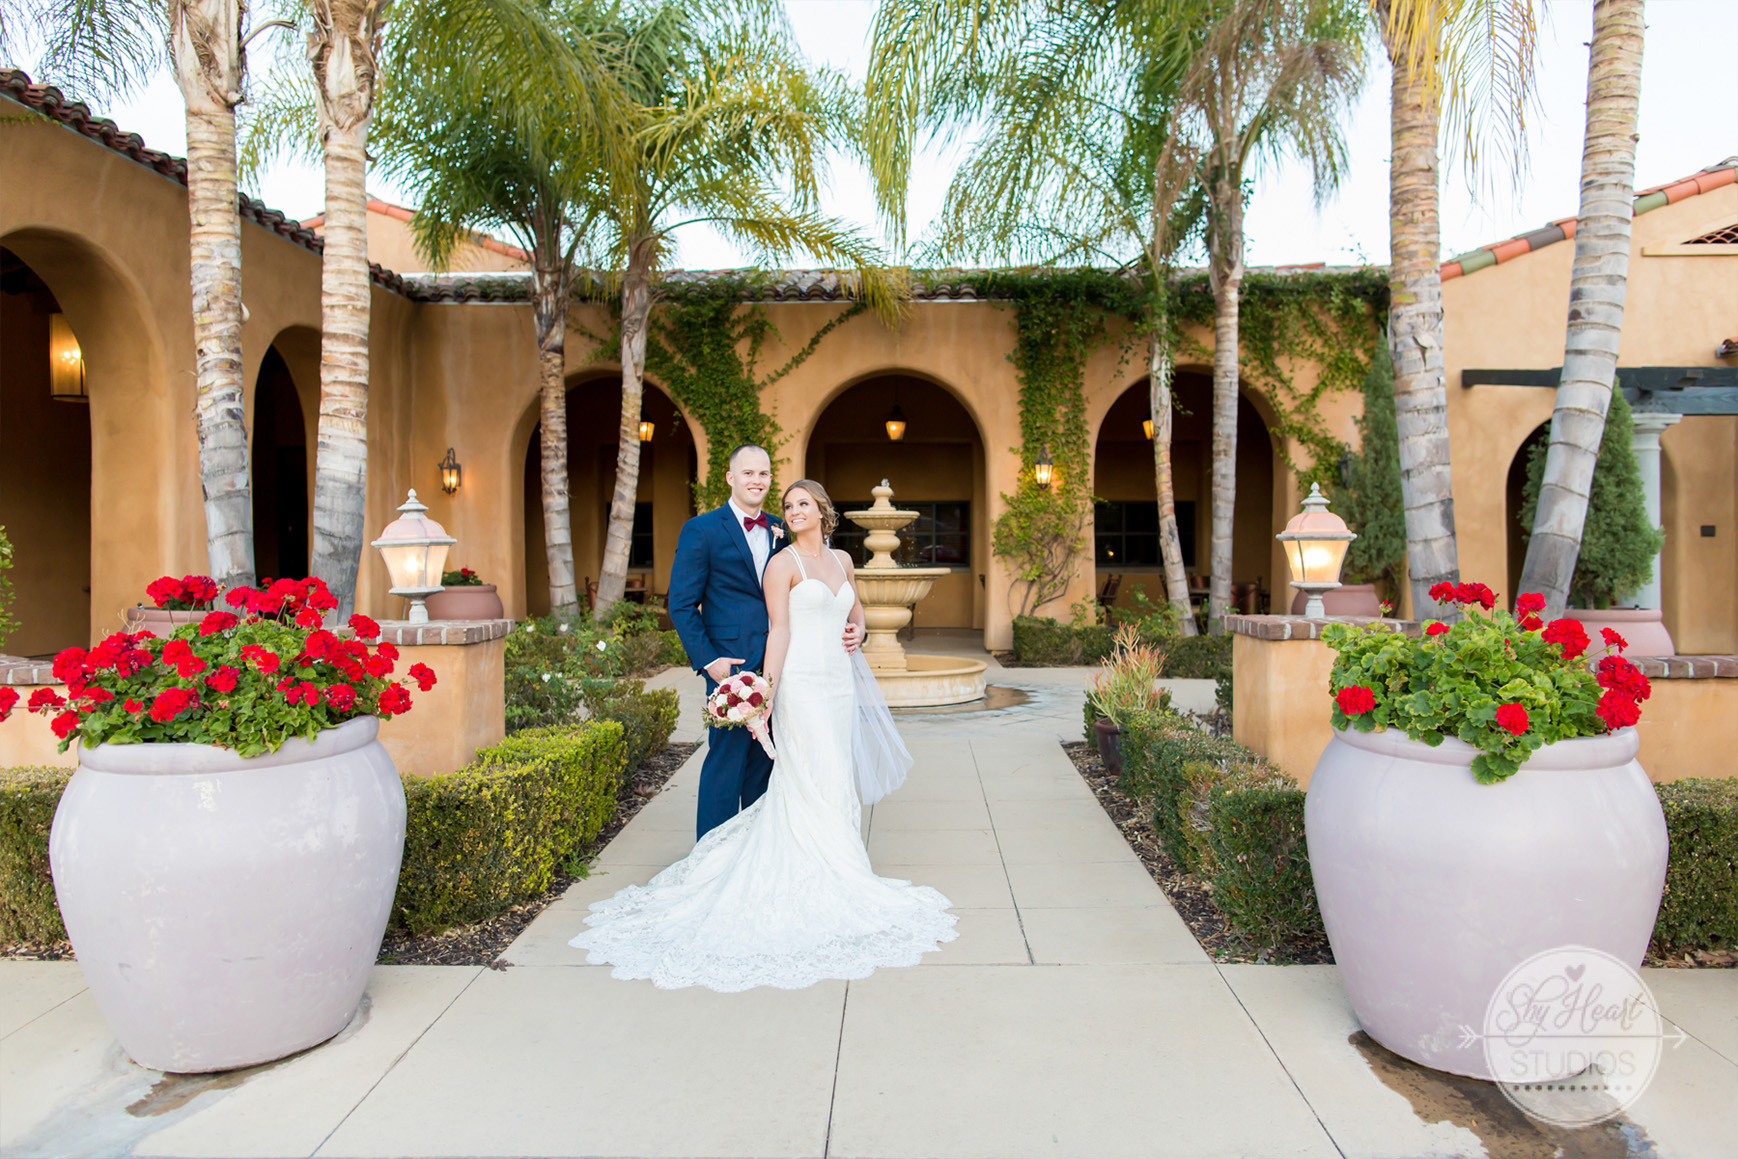 Bride & groom by fountain - The Retreat - Corona, California - Riverside County - Wedgewood Weddings